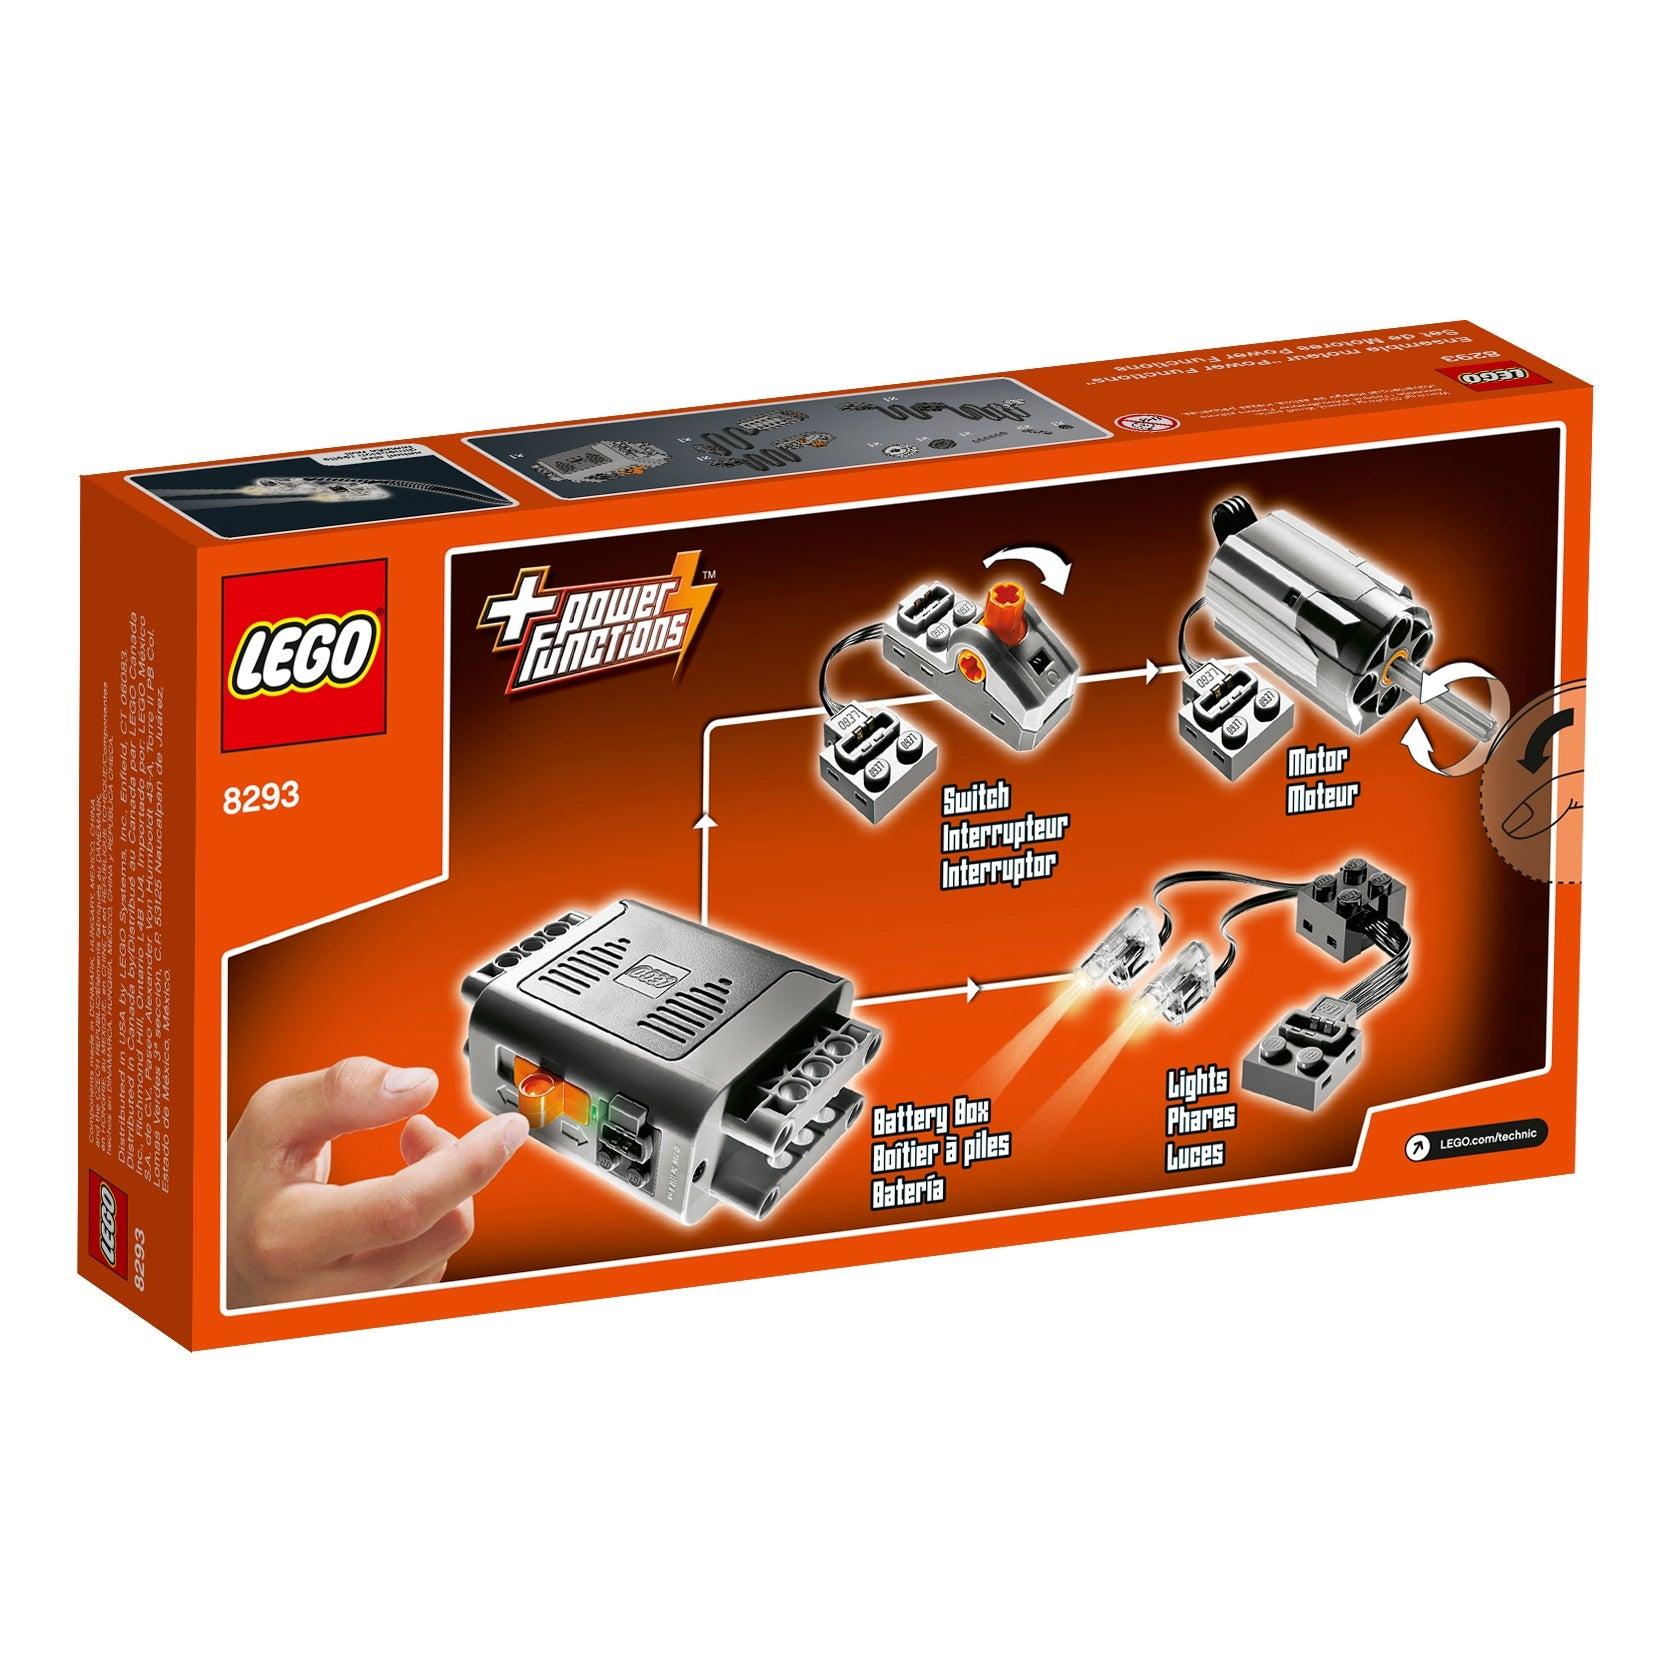 LEGO TECHNIC 8293 SET POWER FUNCTIONS